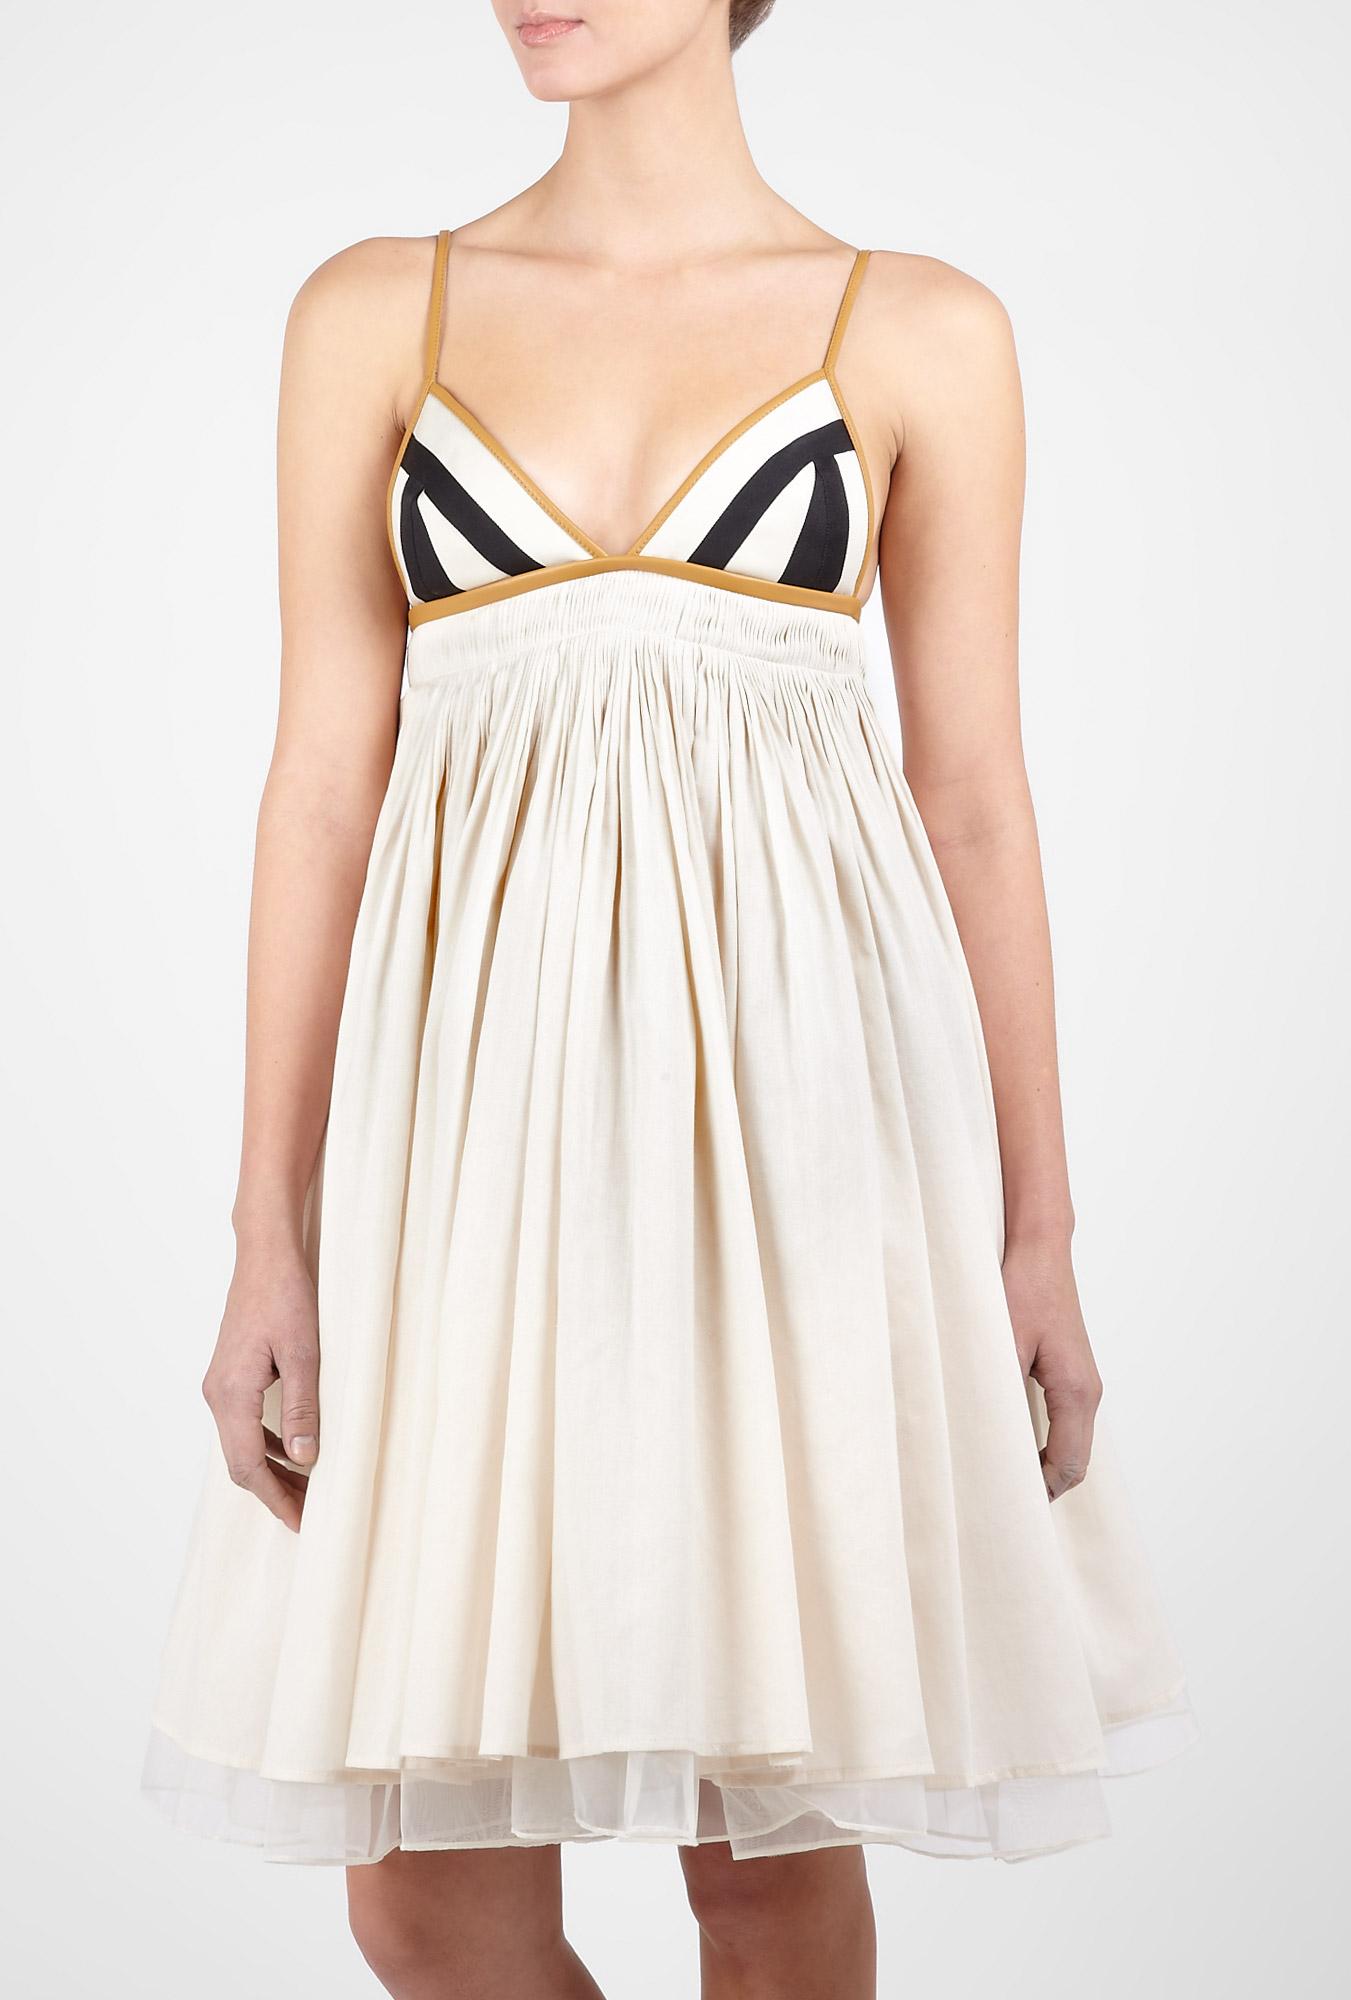 By Malene Birger | Manrida Summer Vail Dress by By Malene Birger